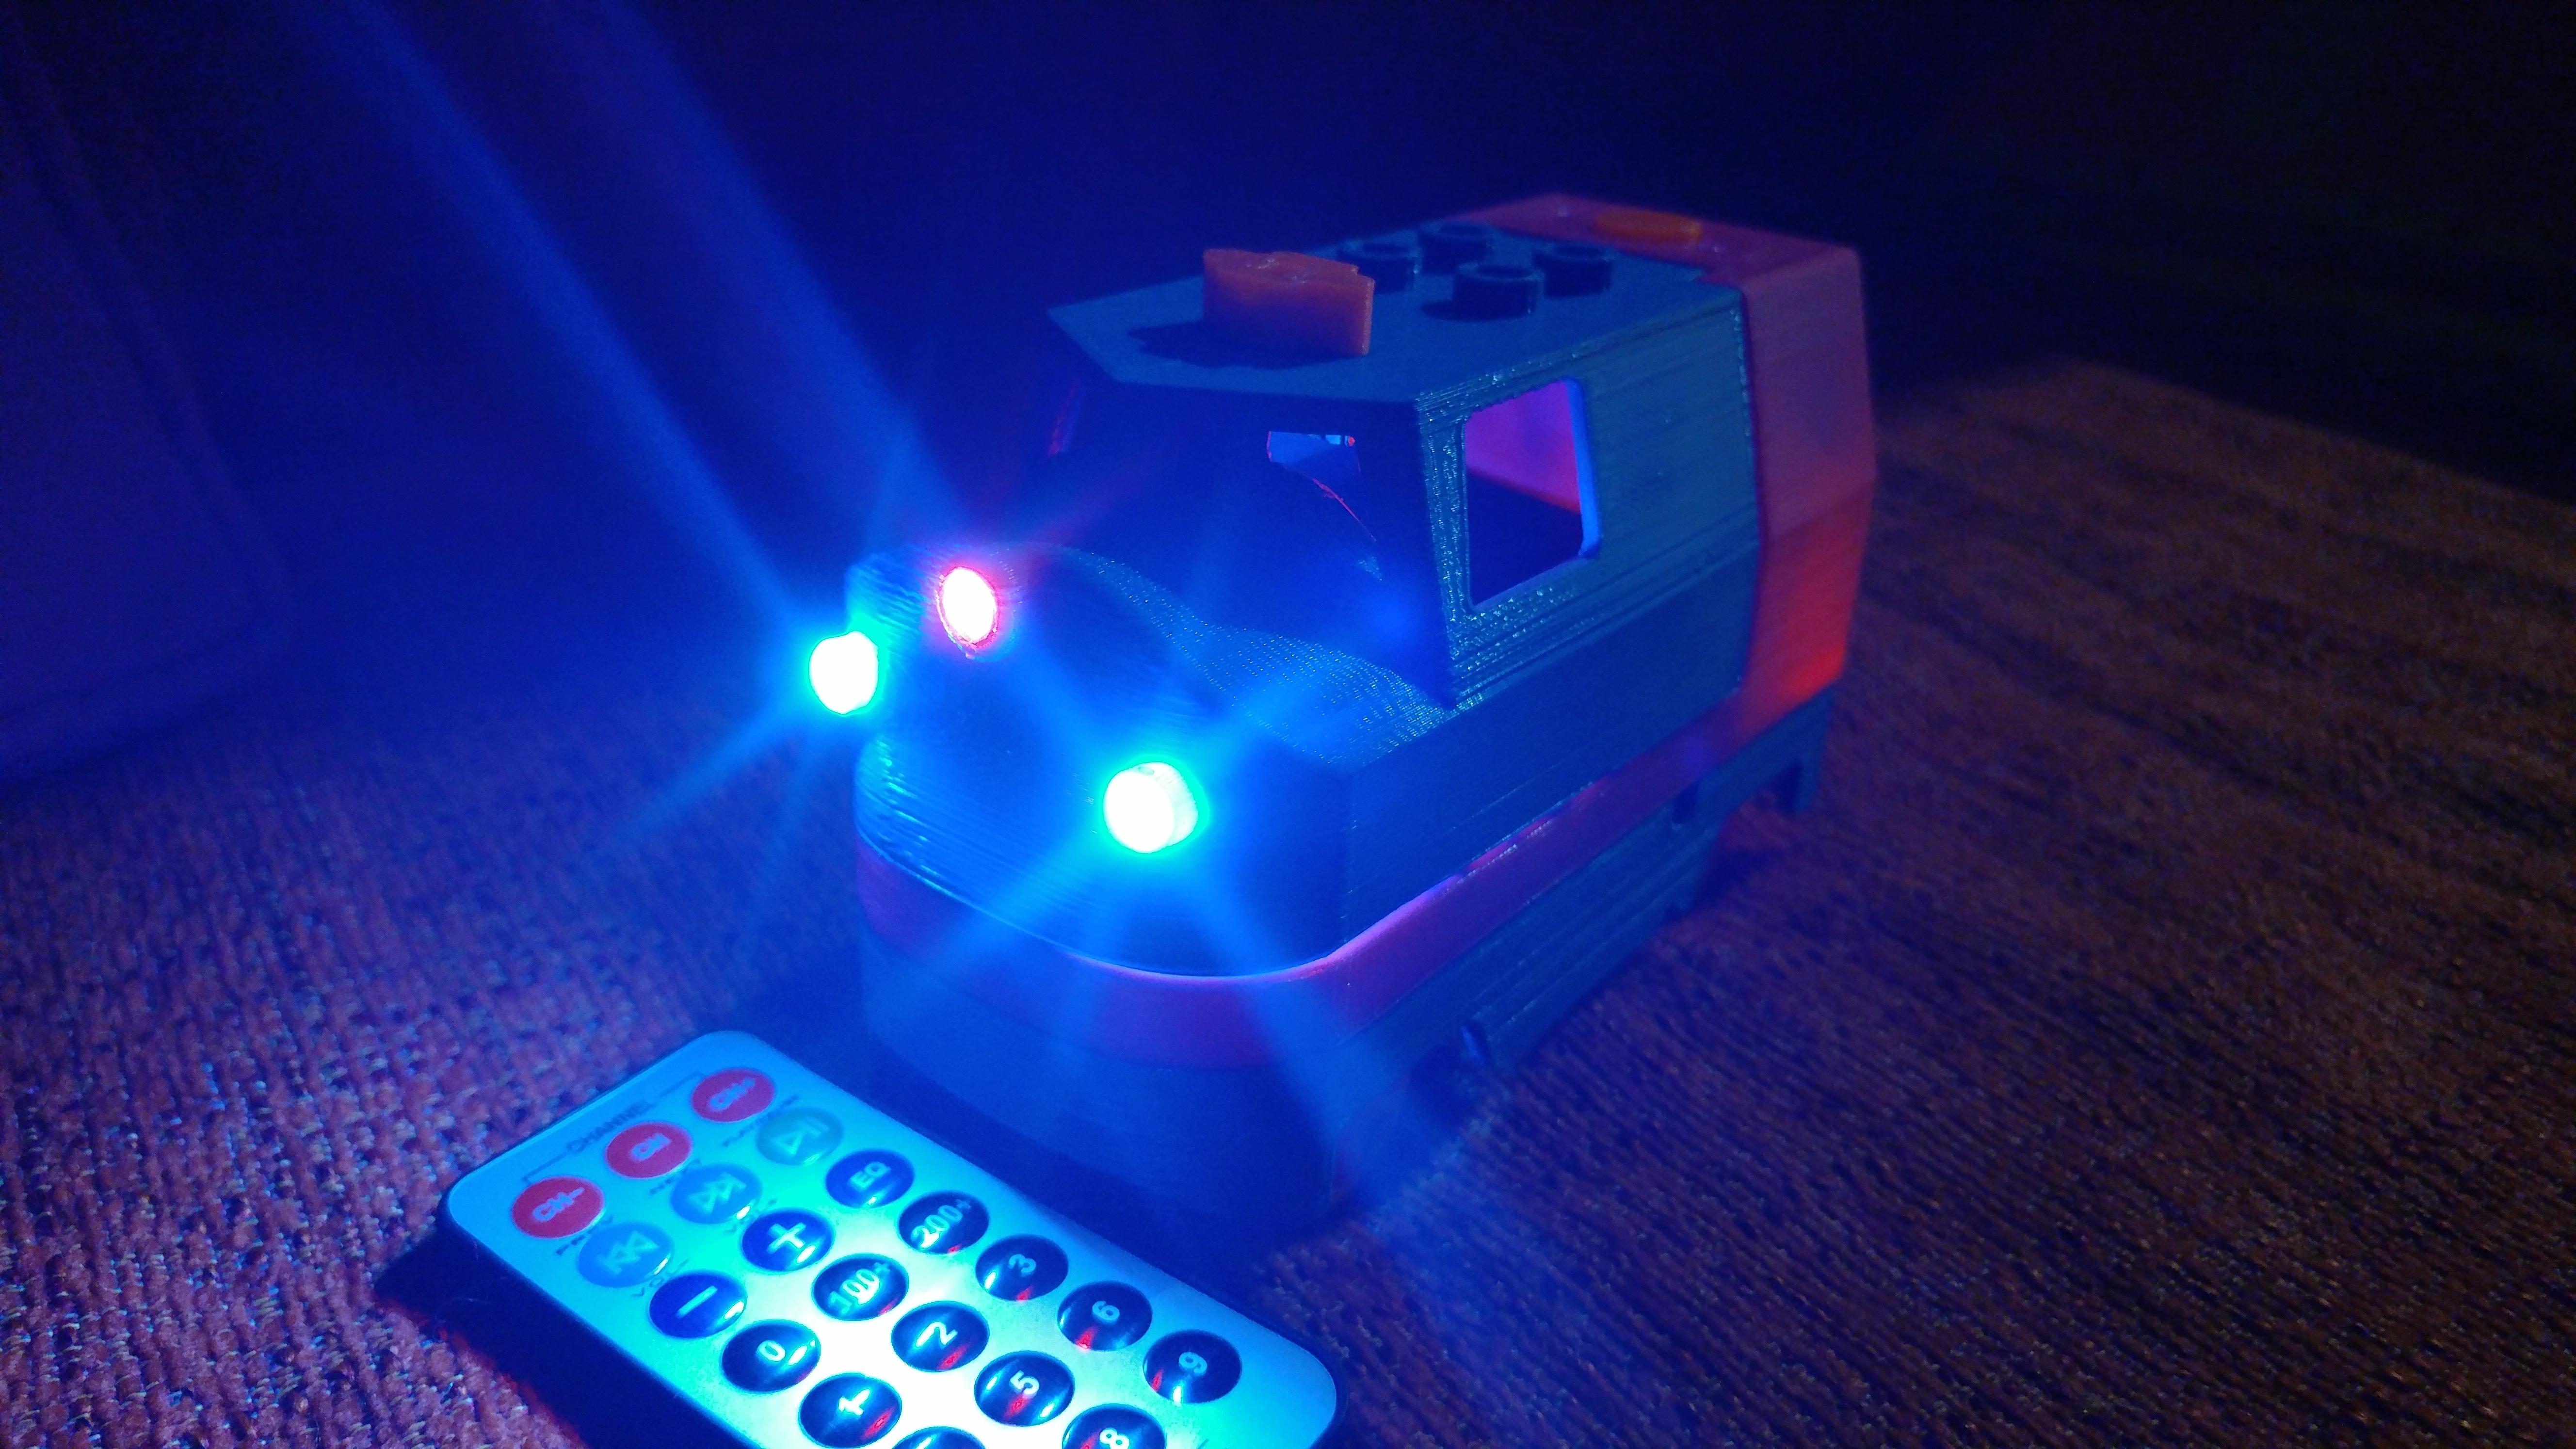 20181222_211358.jpg Télécharger fichier STL gratuit Tren Lego Duplo Motorizado controlado por Infrarojos • Objet à imprimer en 3D, celtarra12